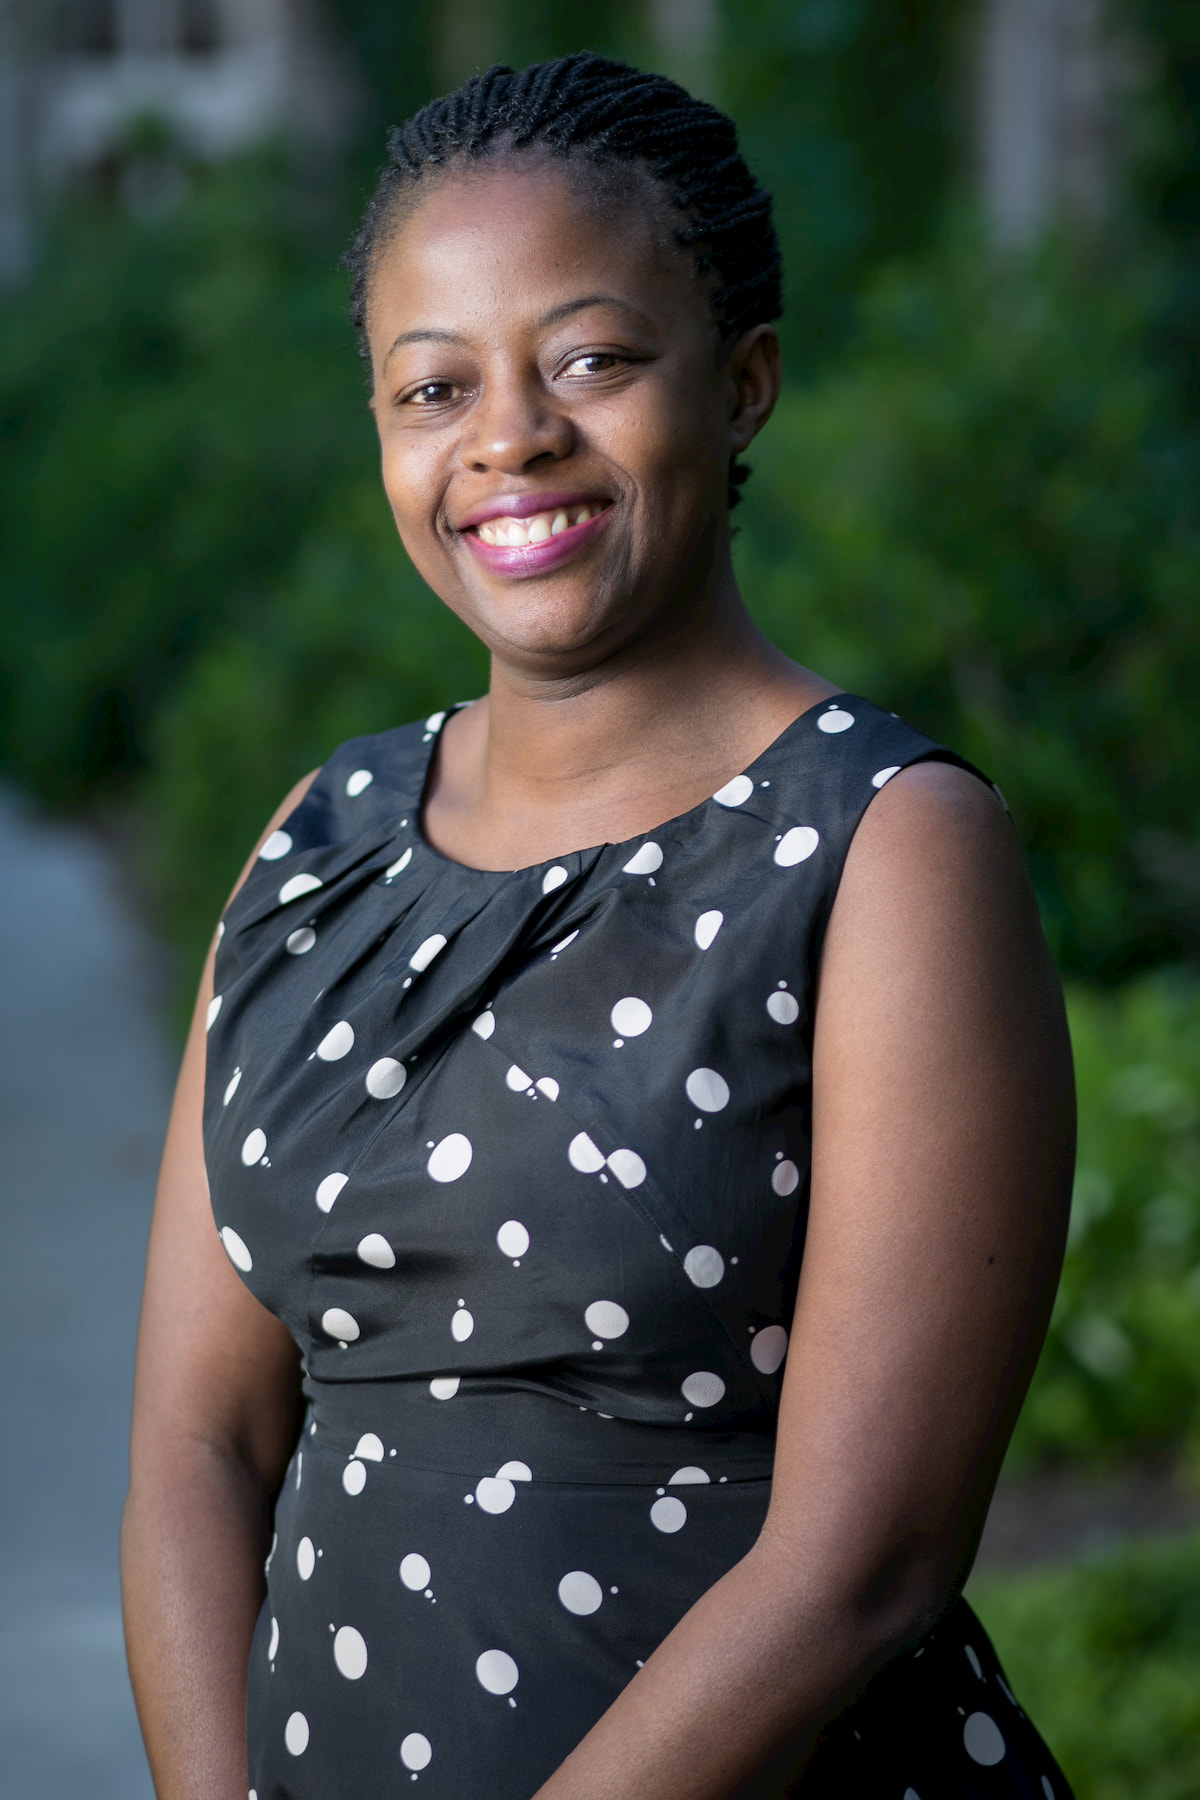 Africa Programme Manager at Penal Reform International